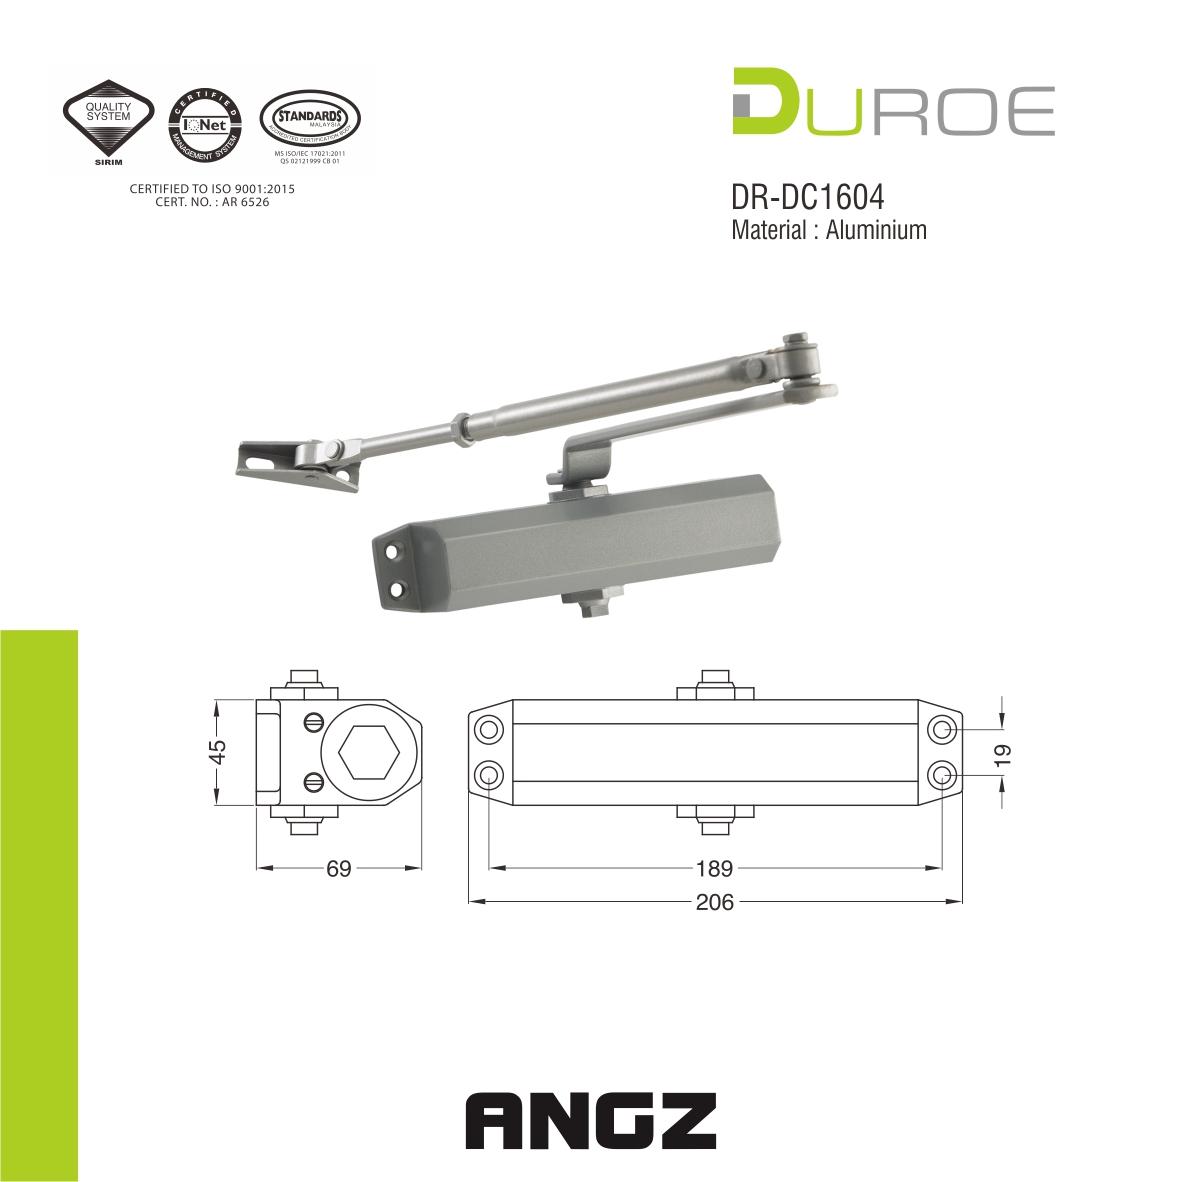 DR-DC1604